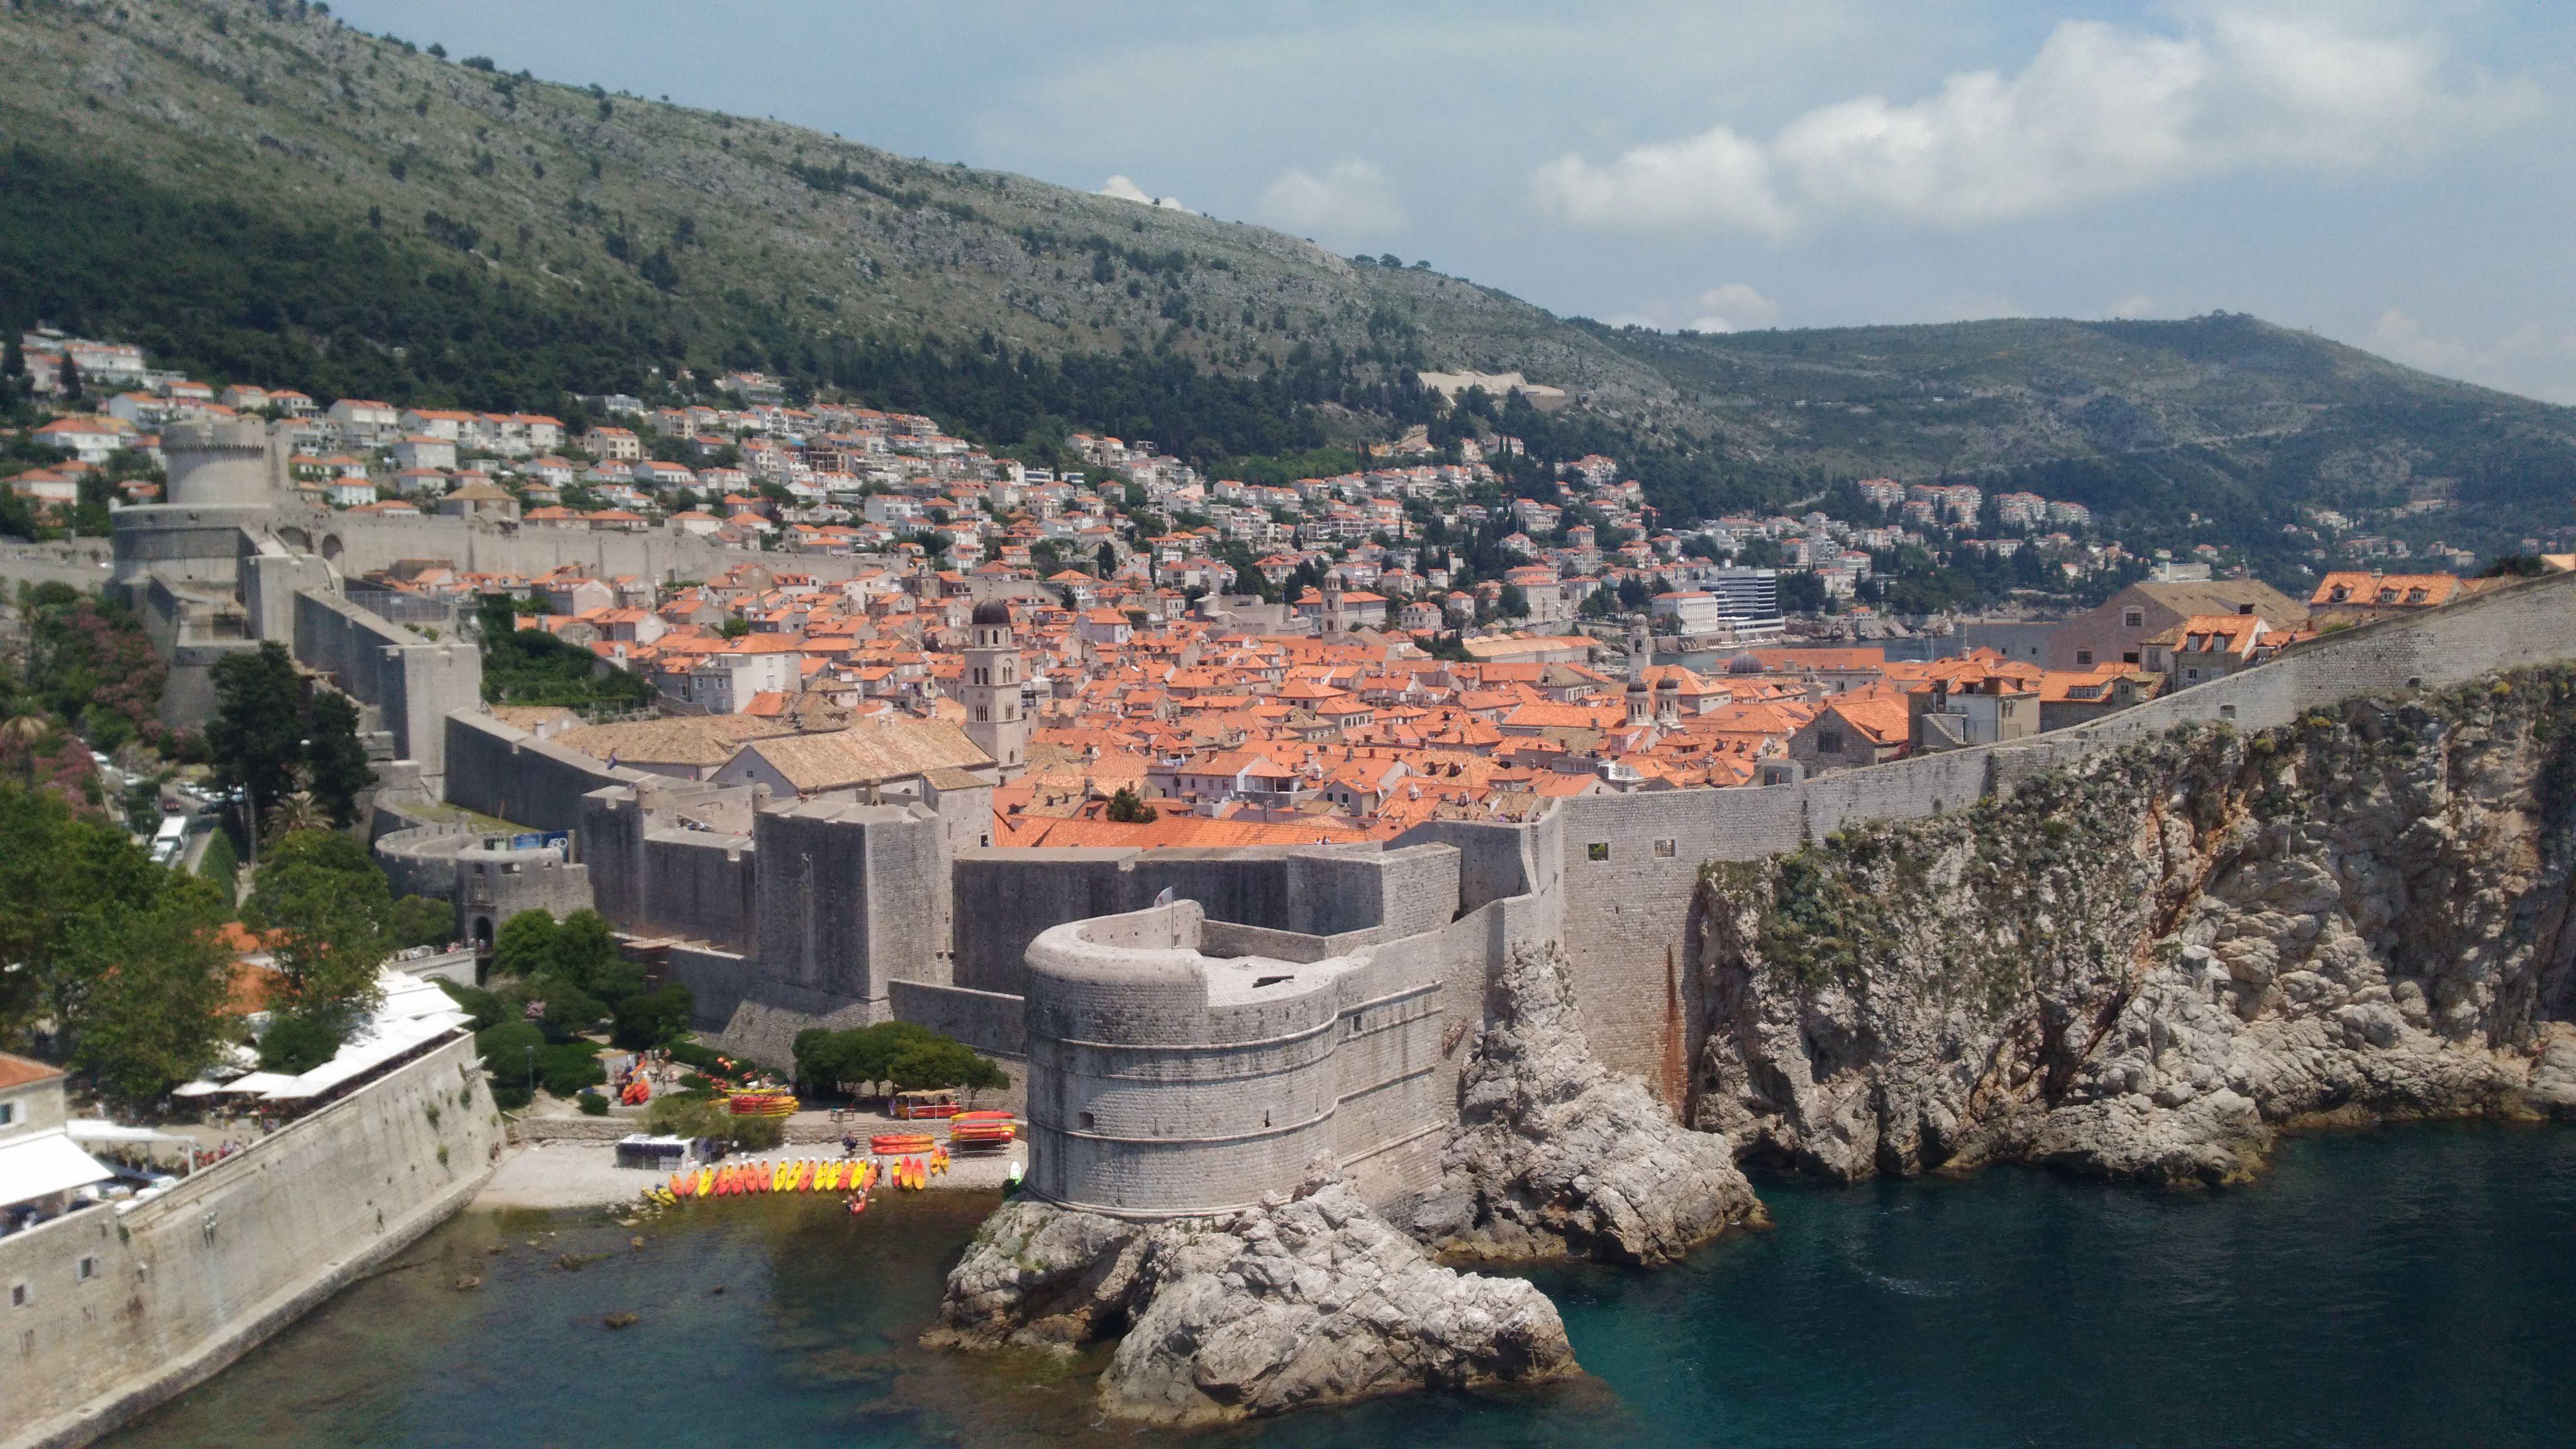 Dubrovnik, Stari grad